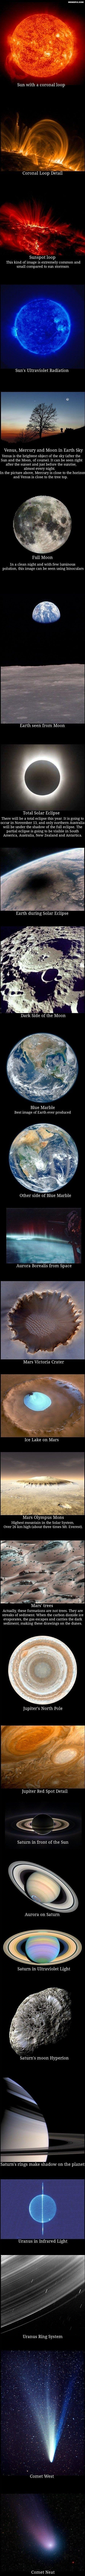 lots of space pix